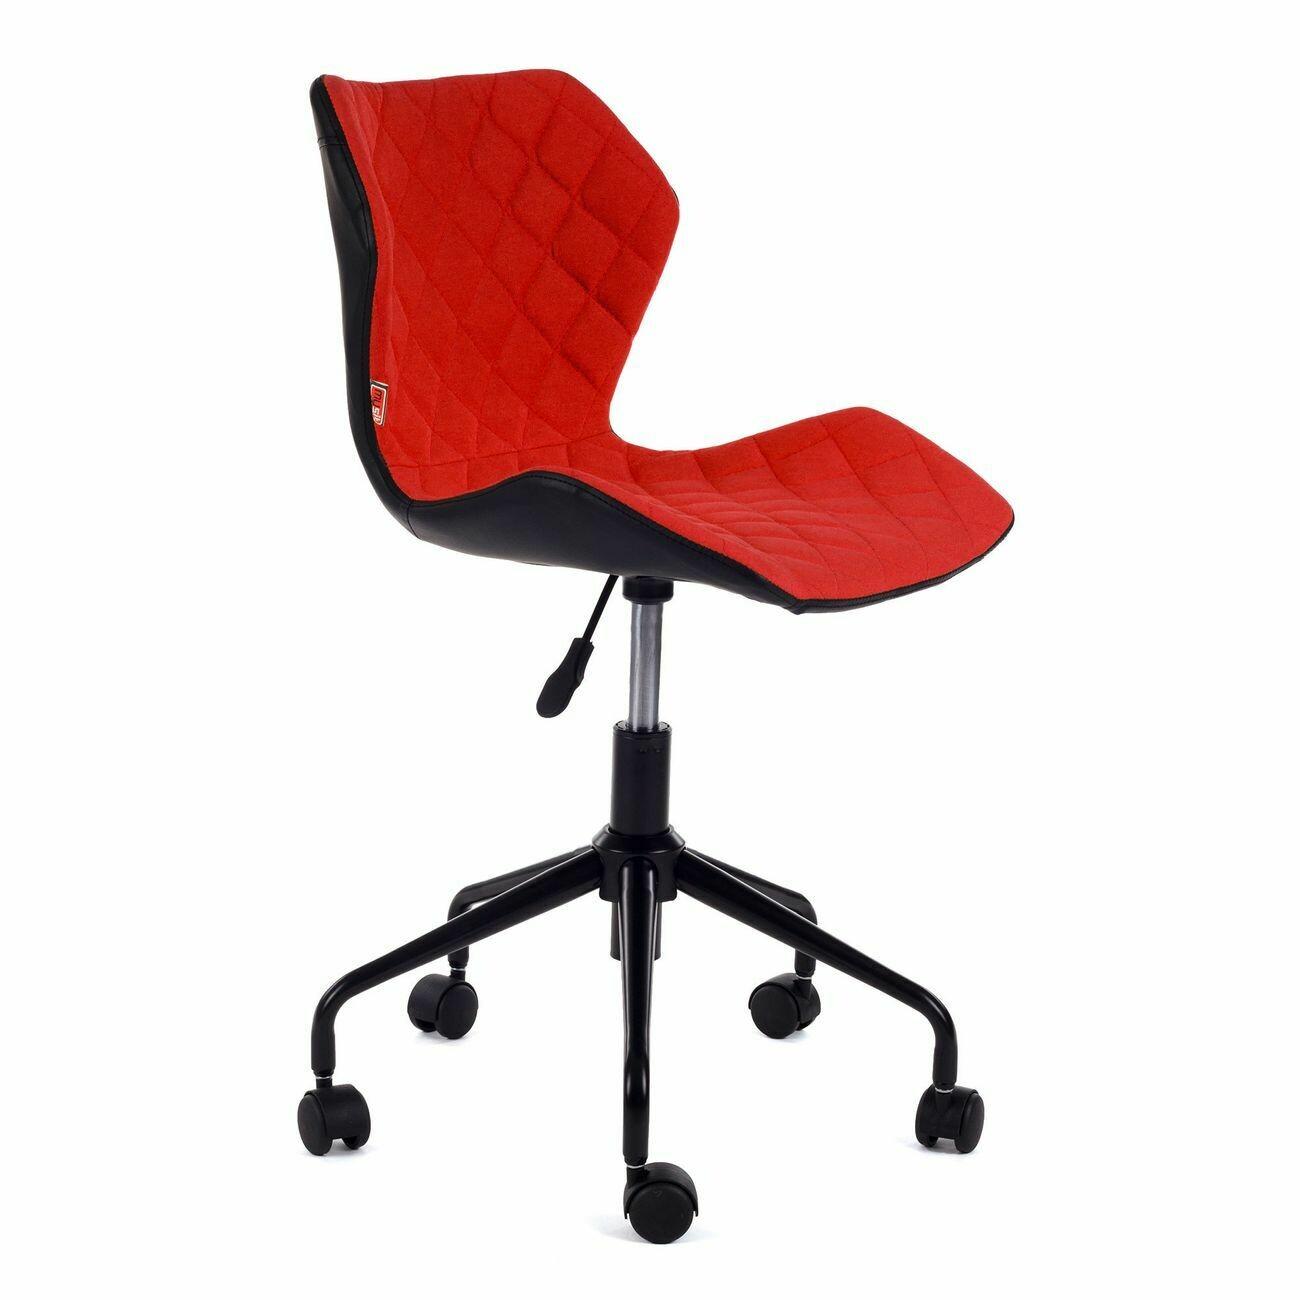 MY SIT Bürostuhl Design-Hocker Drehstuhl Stuhl INO Rot/Schwarz